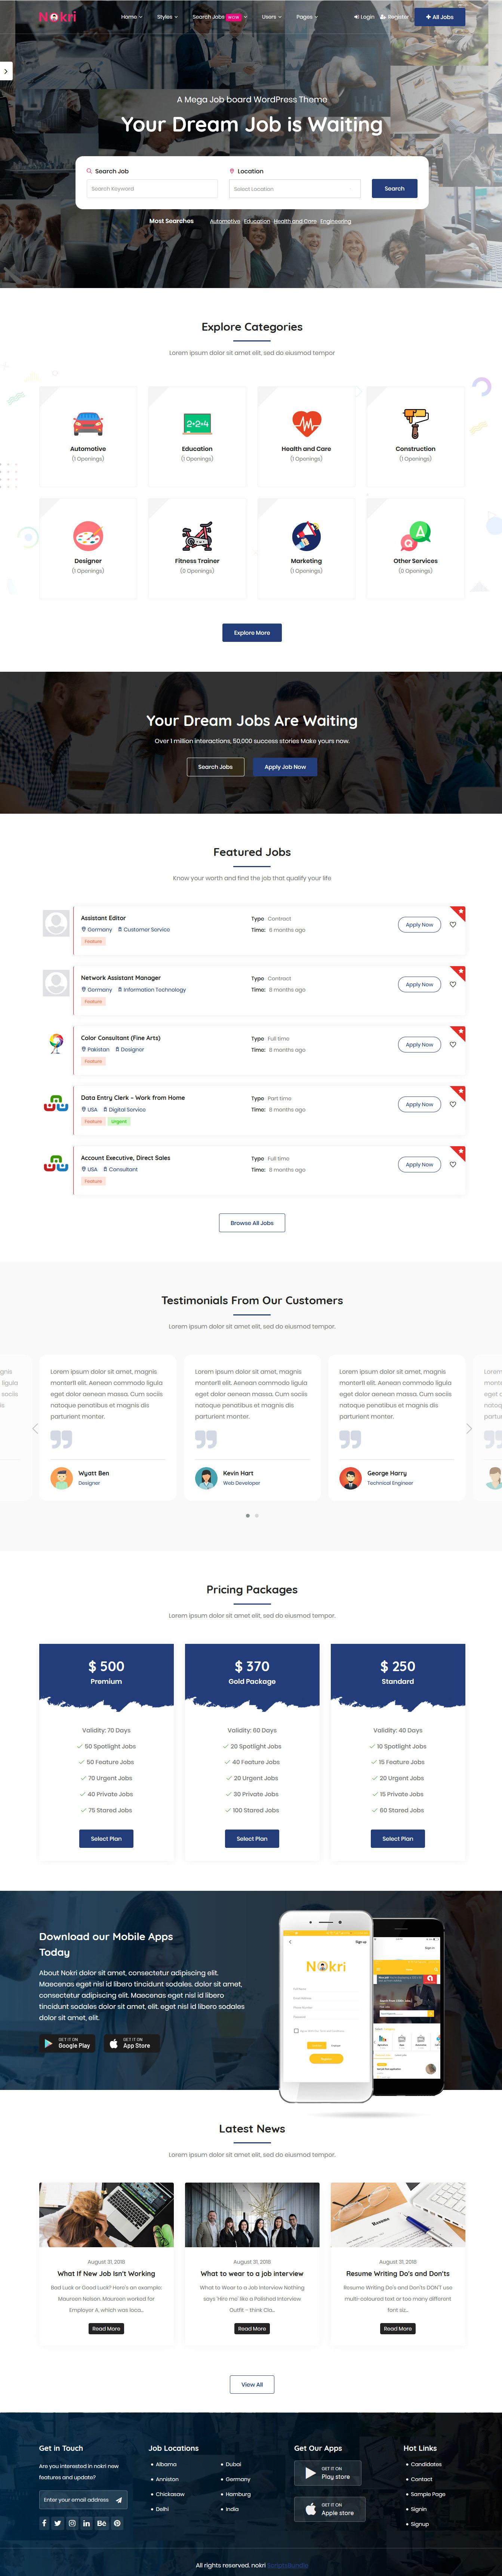 Nokri - Best Premium Job Board WordPress Theme